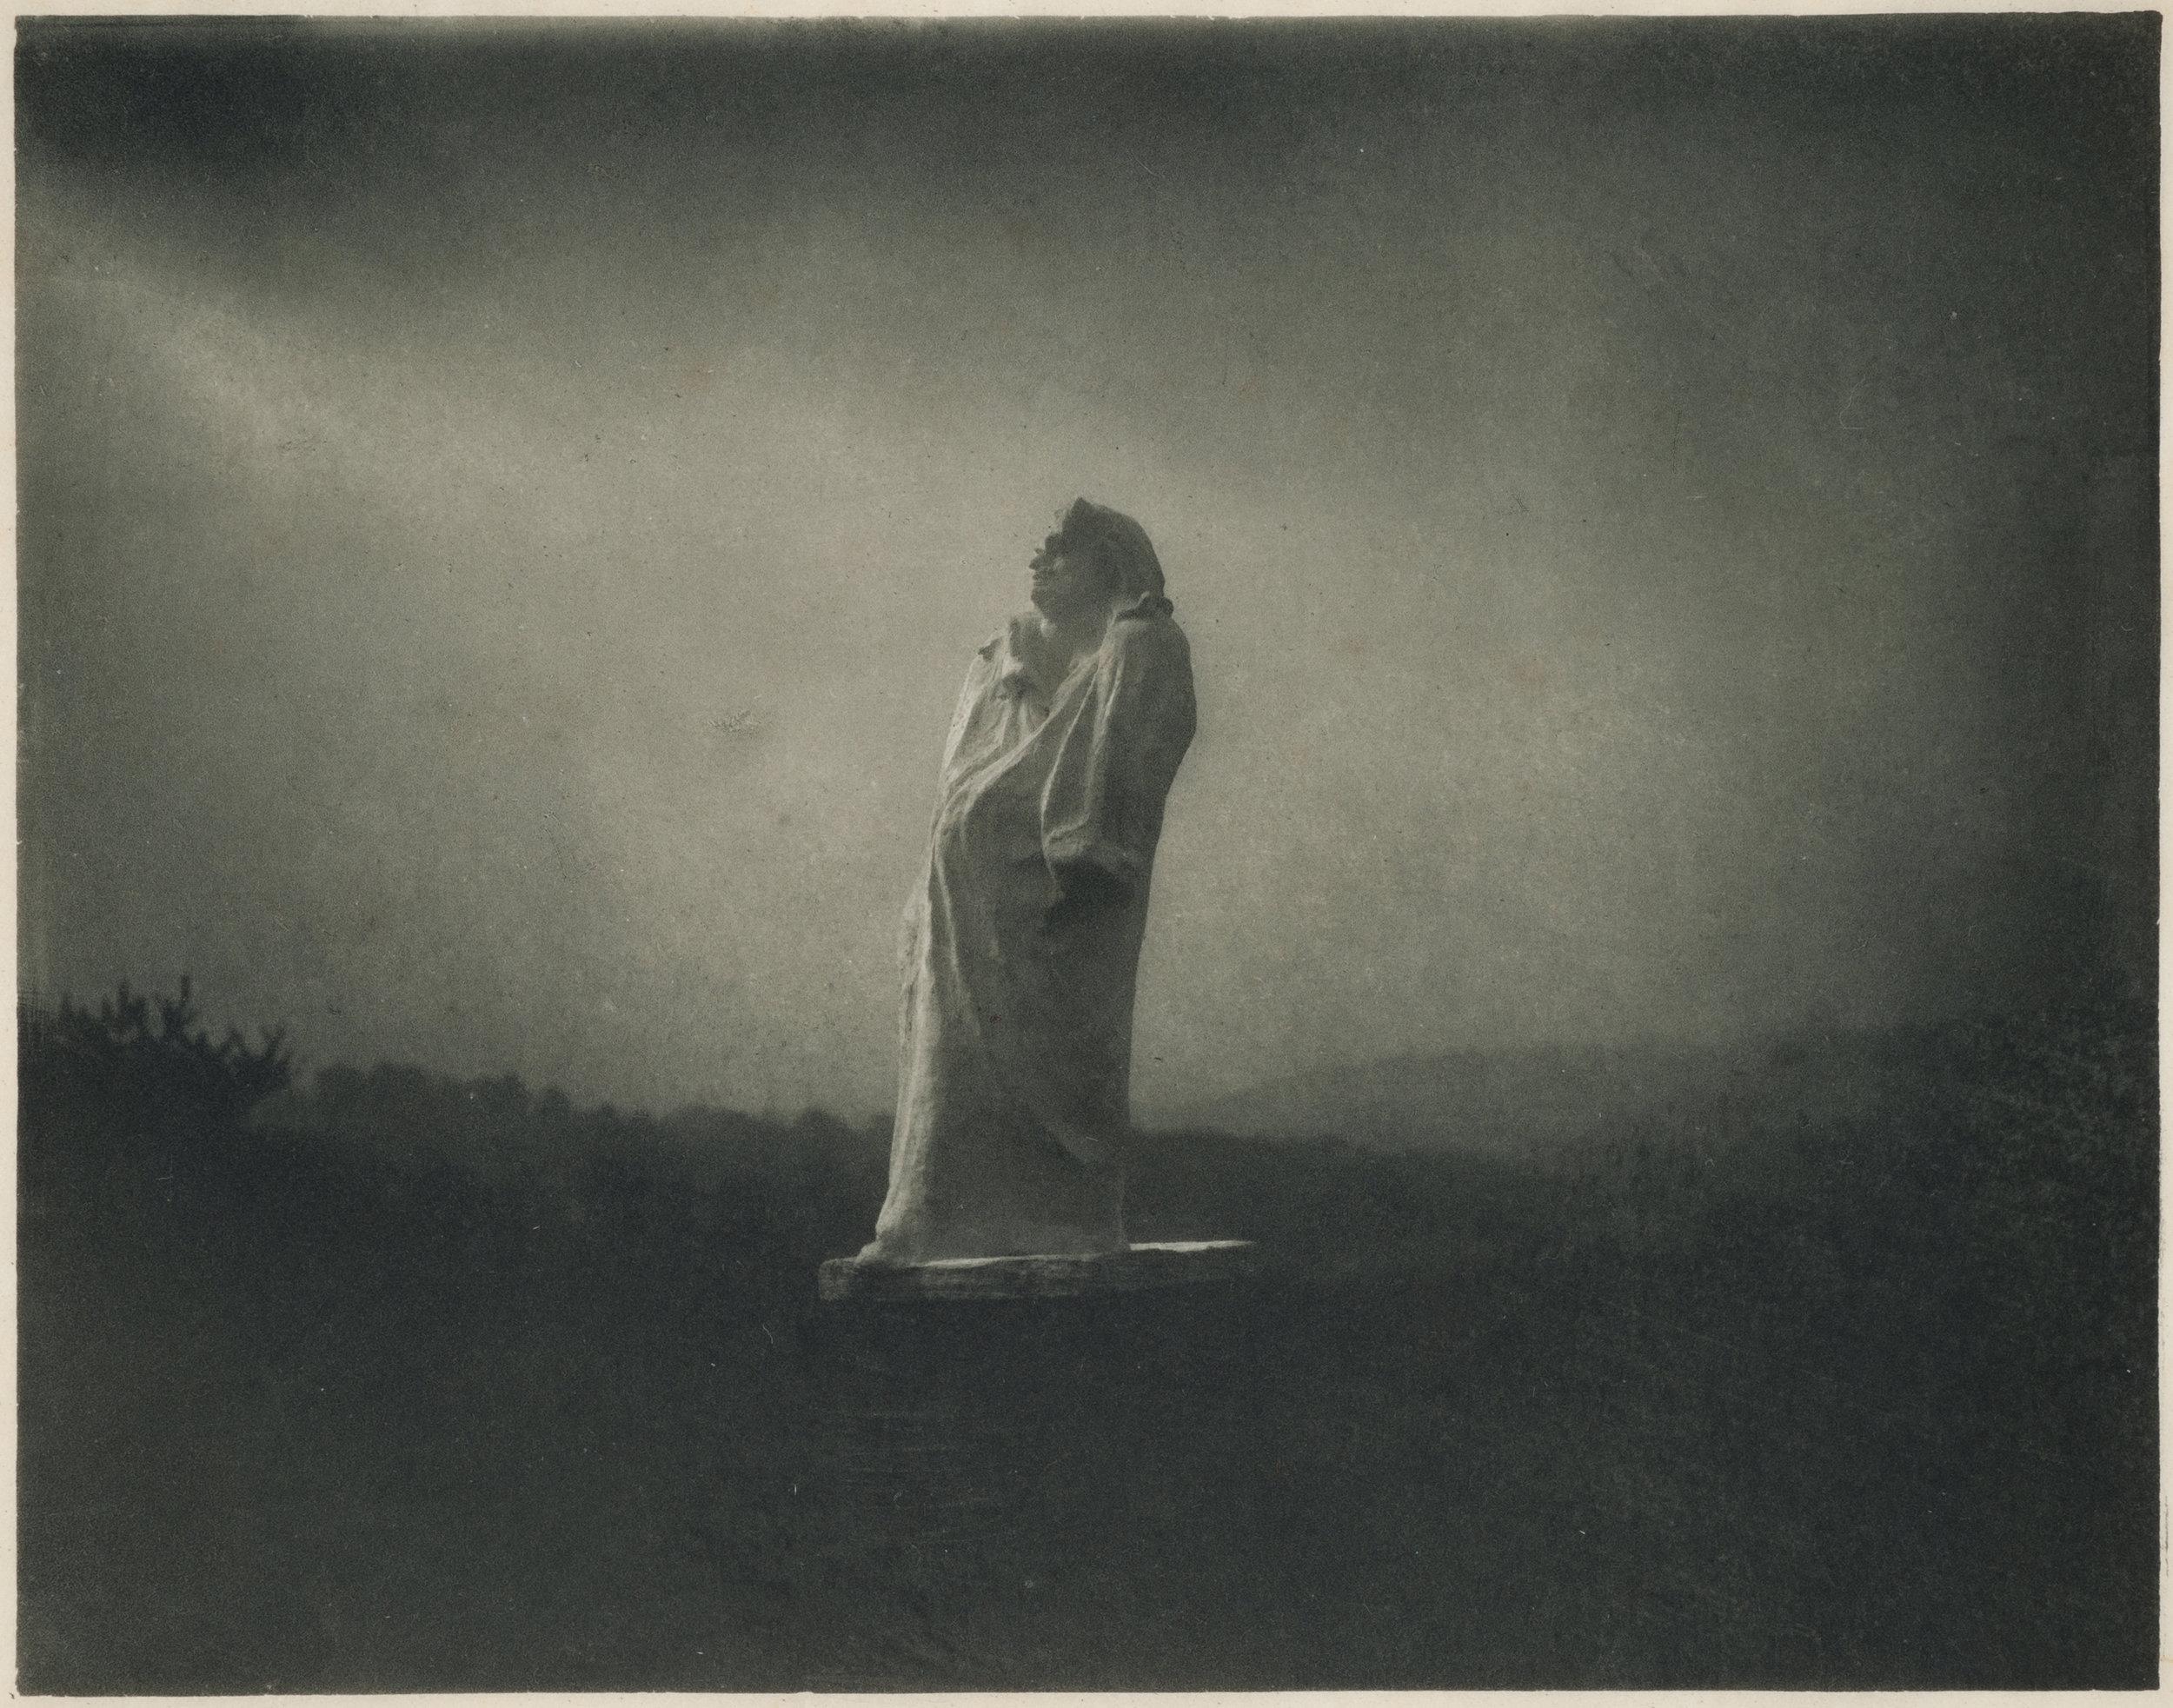 Balzac - Towards the Light, Midnight, 1911